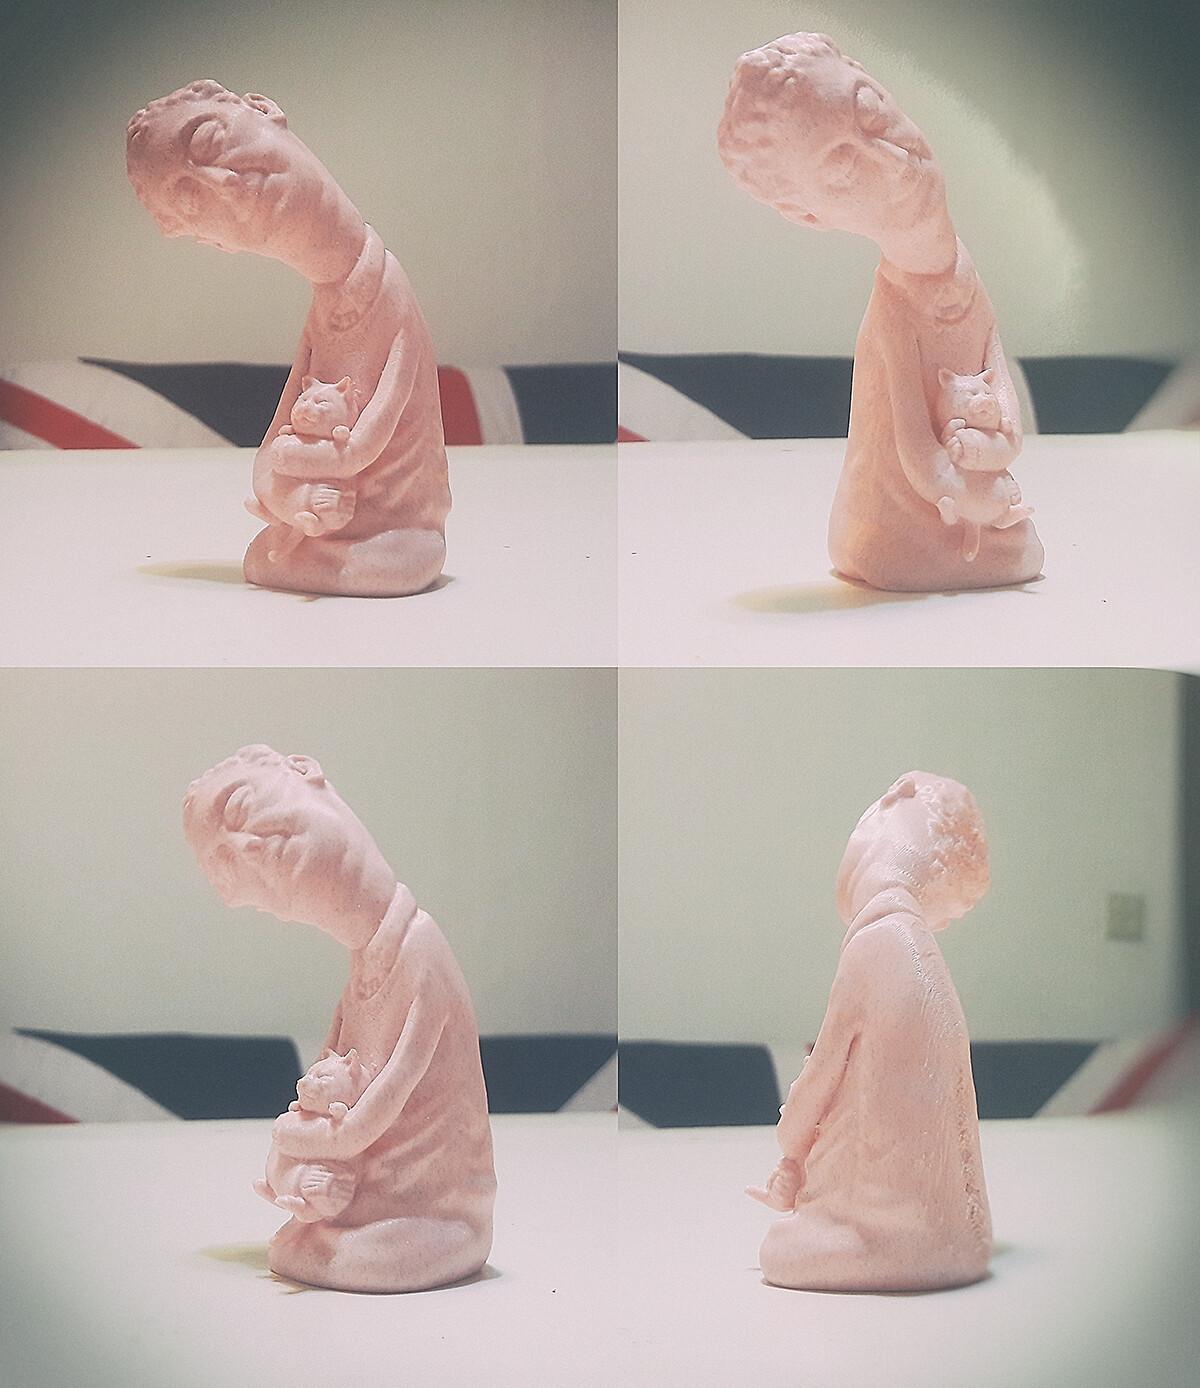 Accompany 3D printing